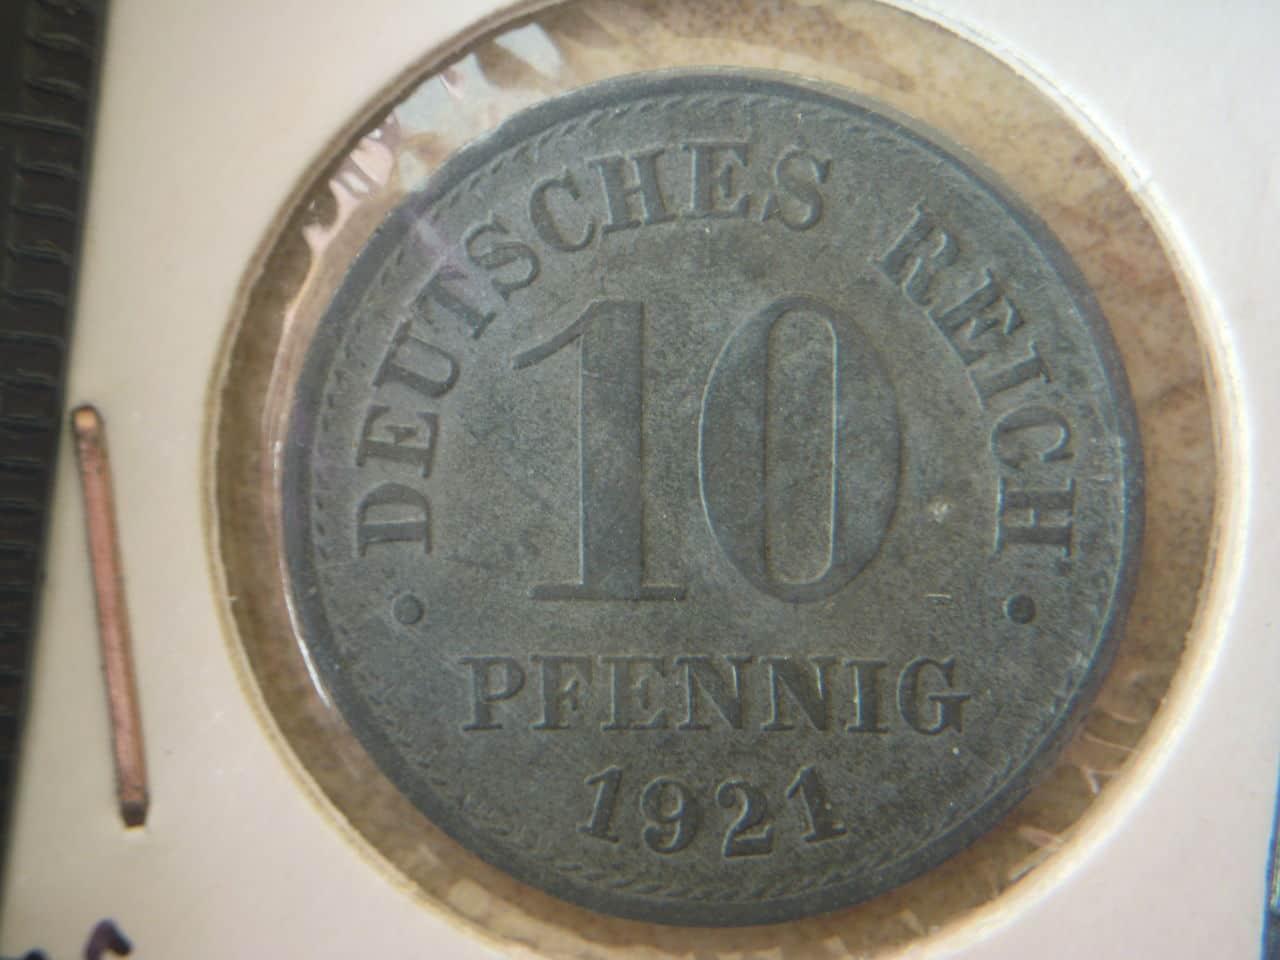 10 Pfennig 1921 Alemania Ceca? DSCN0889